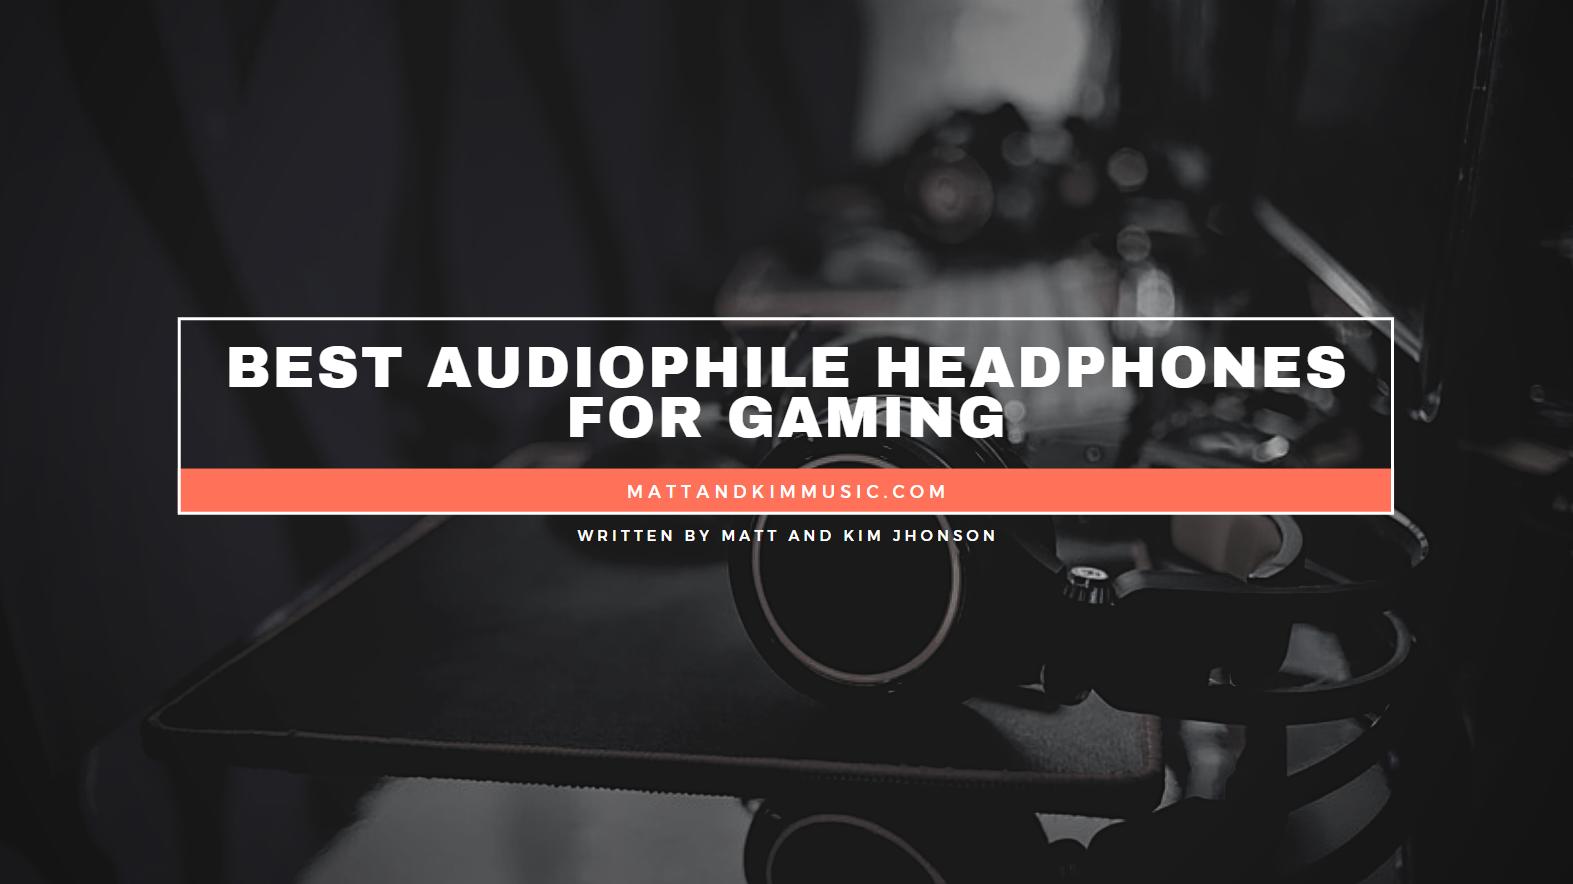 Best Audiophile Headphones for Gaming